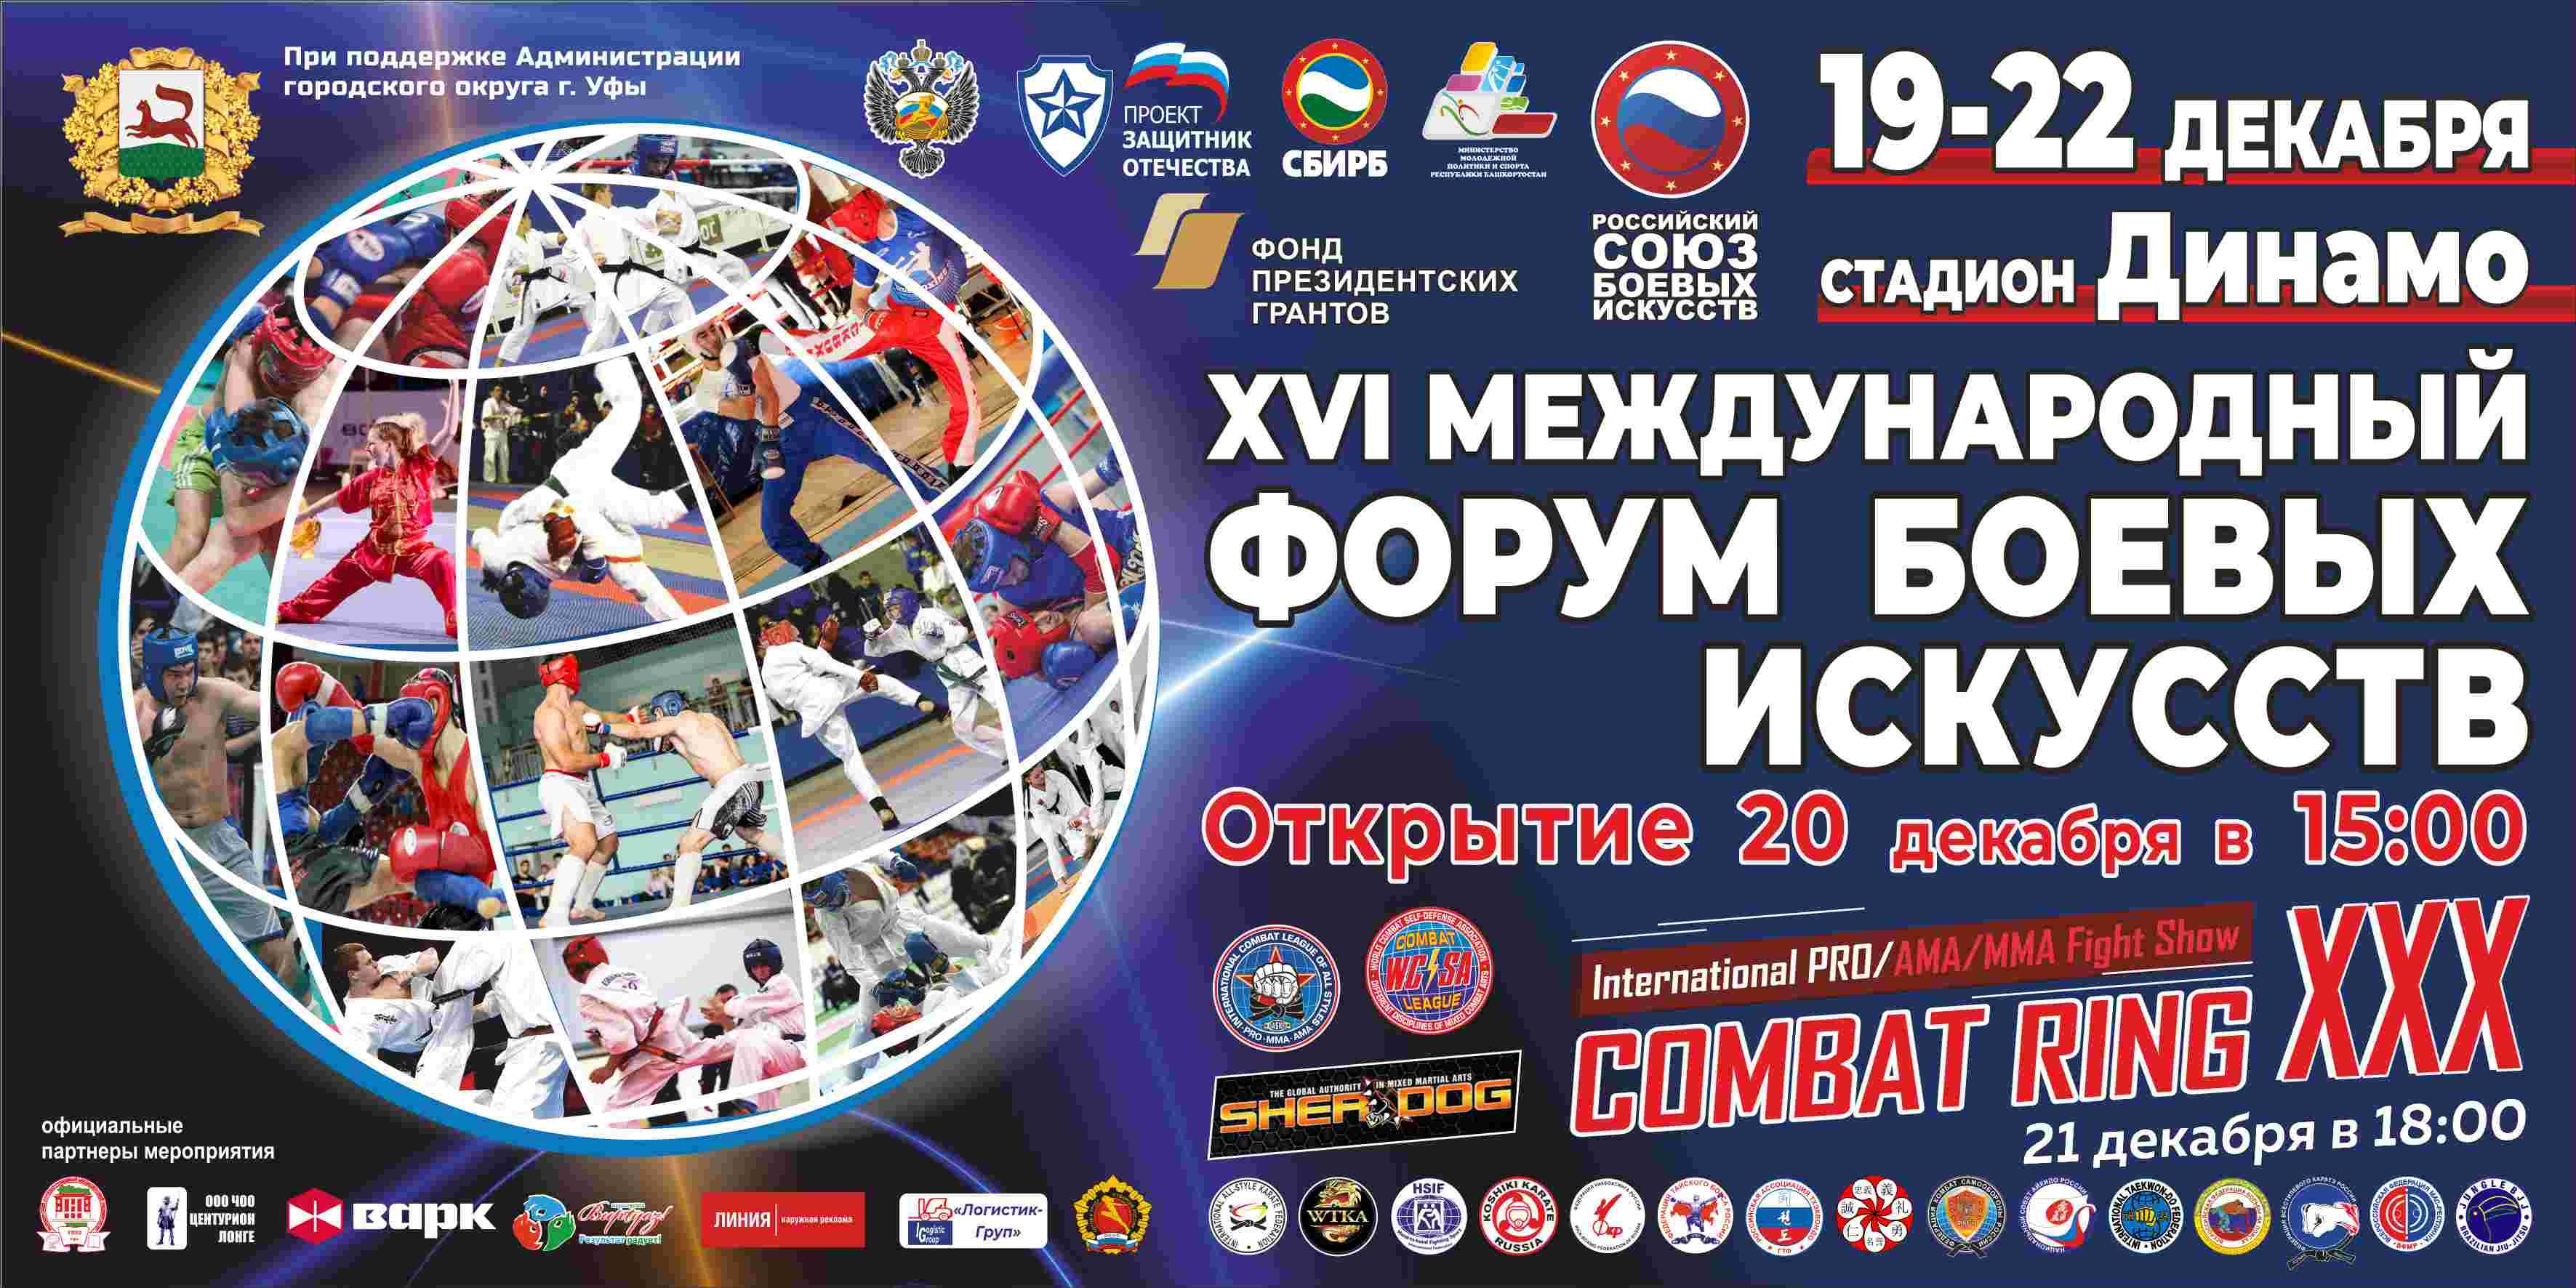 http://sbirb.combatsd.ru/images/upload/РСБИ_баннер300_шф240_6000х3000%20(1).jpg